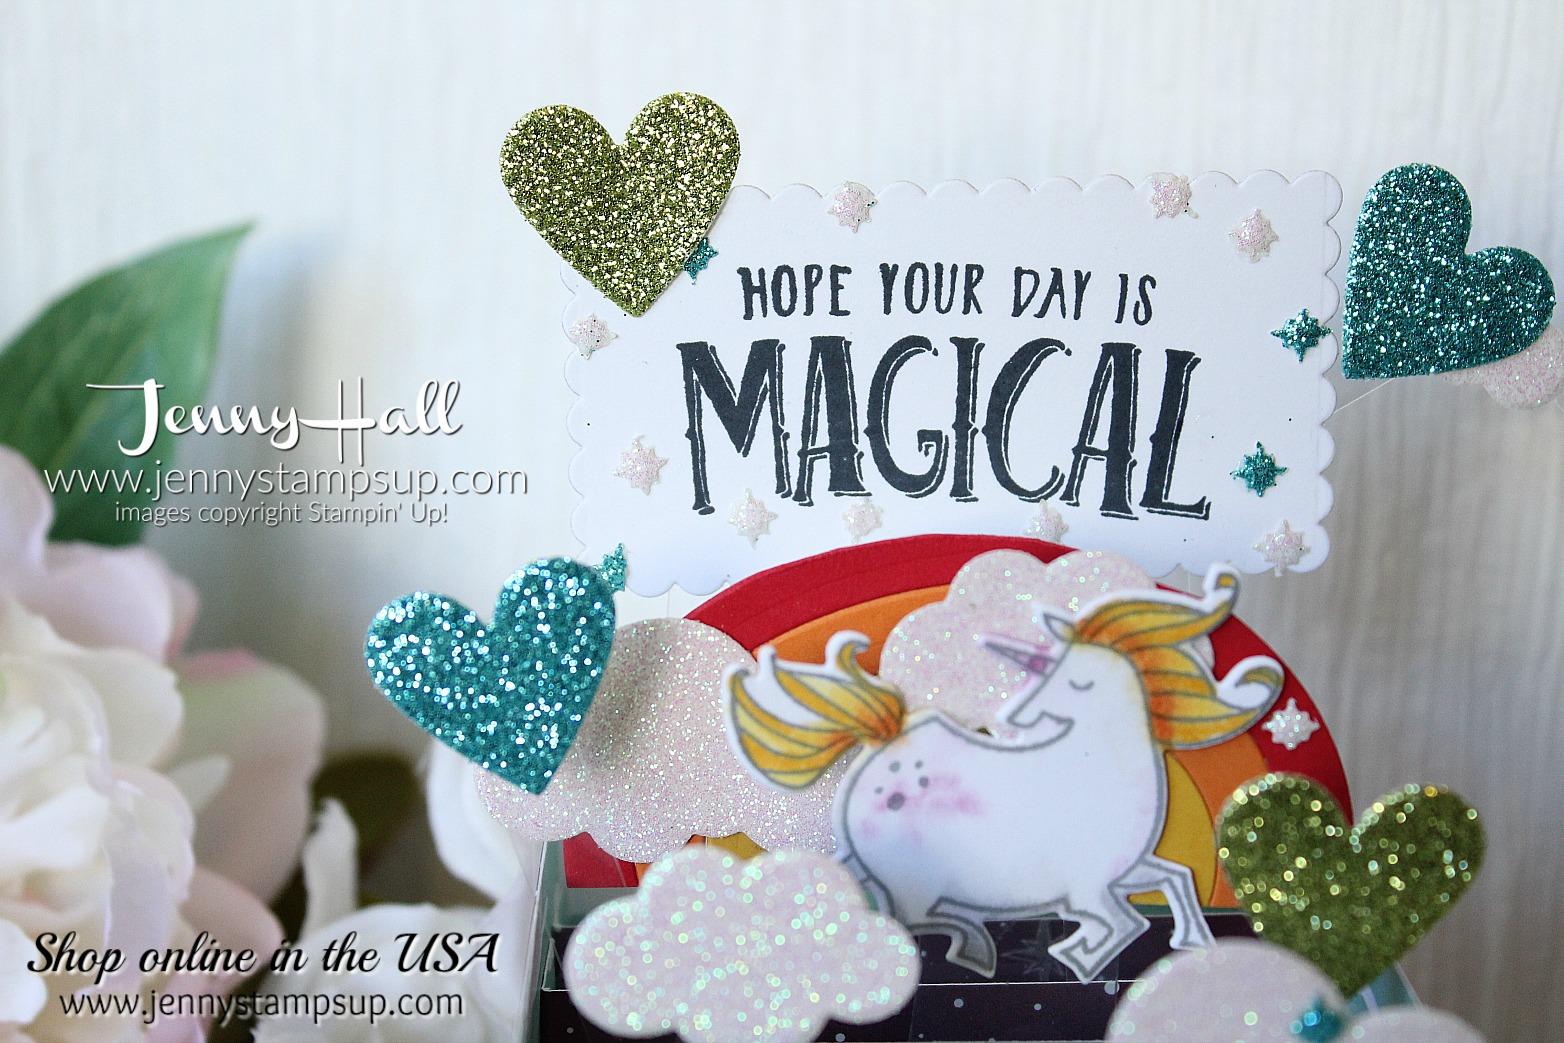 Magical Day Box Card by Jenny Hall at www.jennyhalldesign.com for #cardmaking #addinktivedesignteam #unicorn #cardinabox #boxcard #getwellcard #stampinup #jennyhalldesign #jennyhallstampinup #mythsandmagicdsp #addinktivedesigns #papercraft #artsandcrafts #craftsforkids #kidfriendlycrafts #makeacardsendacard #fancyfold #fancyfoldcard